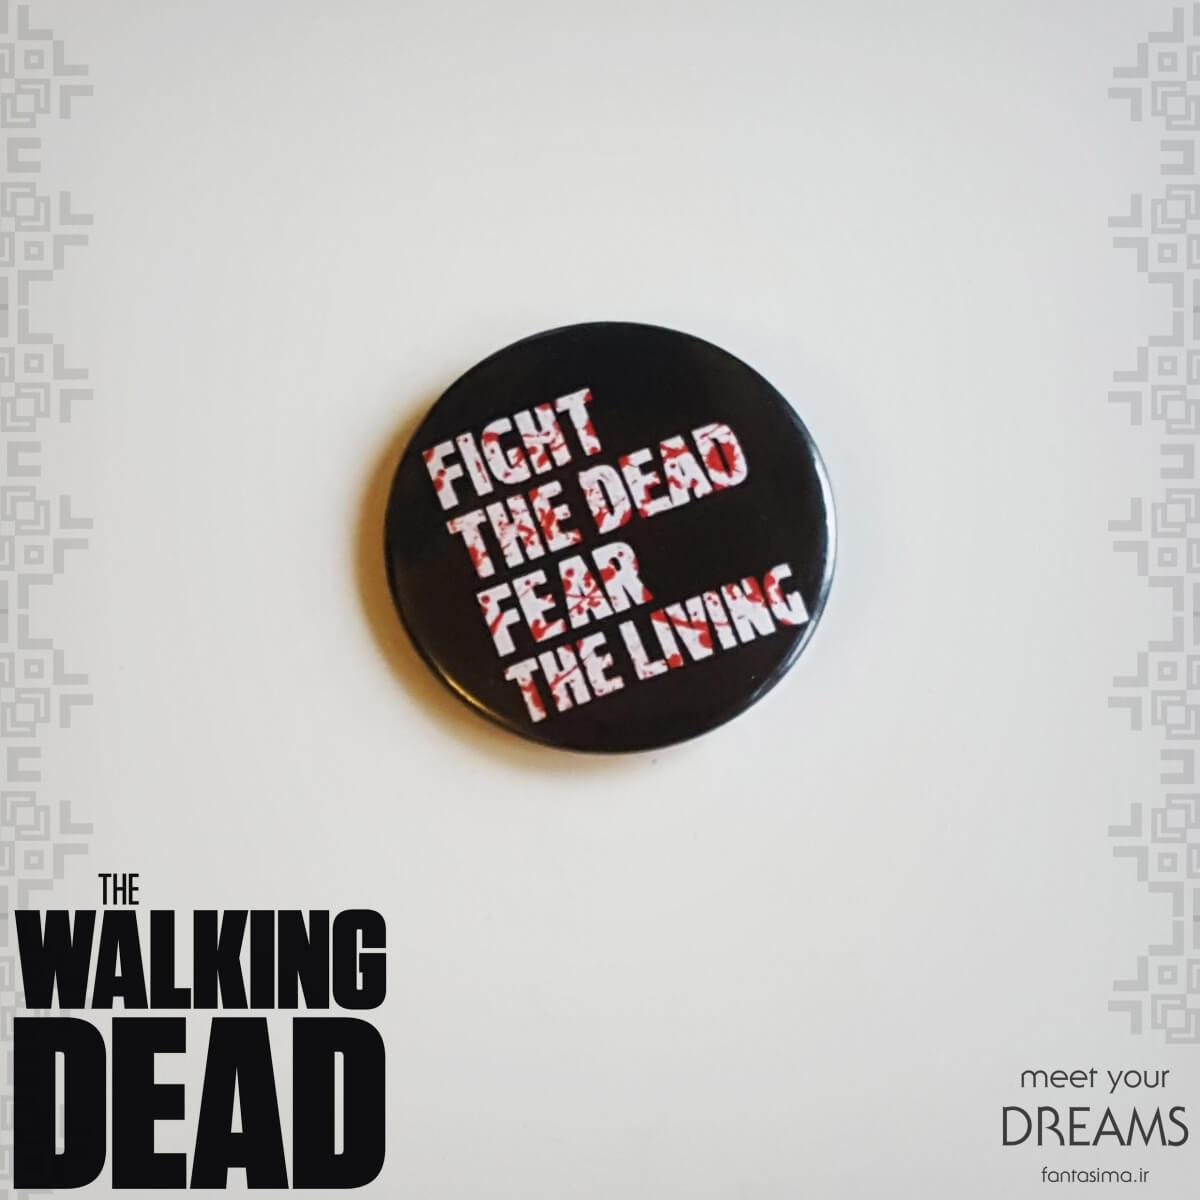 پیکسل فلزی fight the dead fear the living